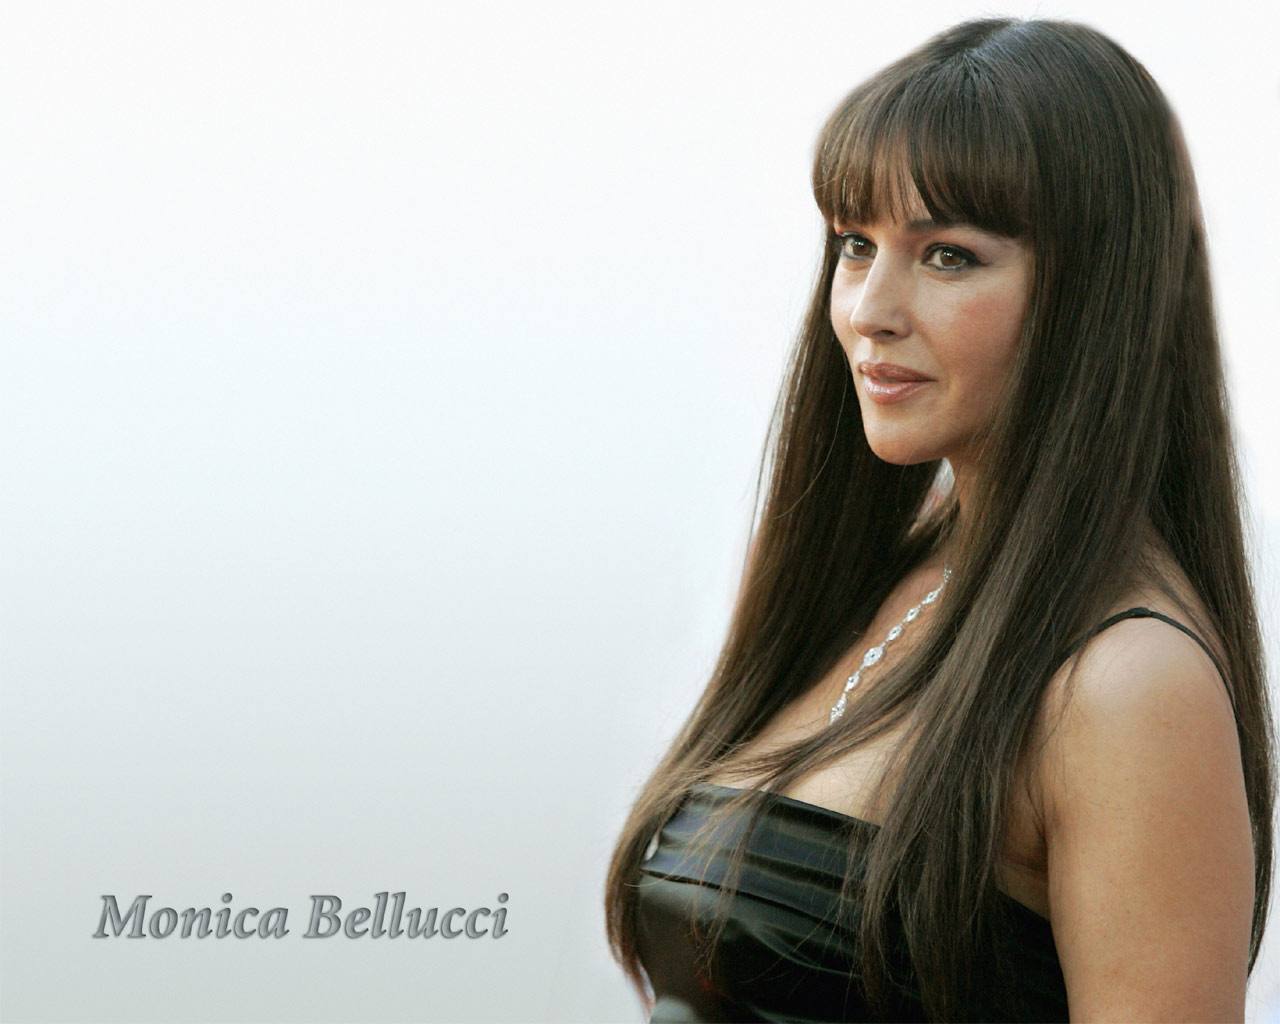 Free Download Monica Bellucci Monica Bellucci Hd Wallpapers